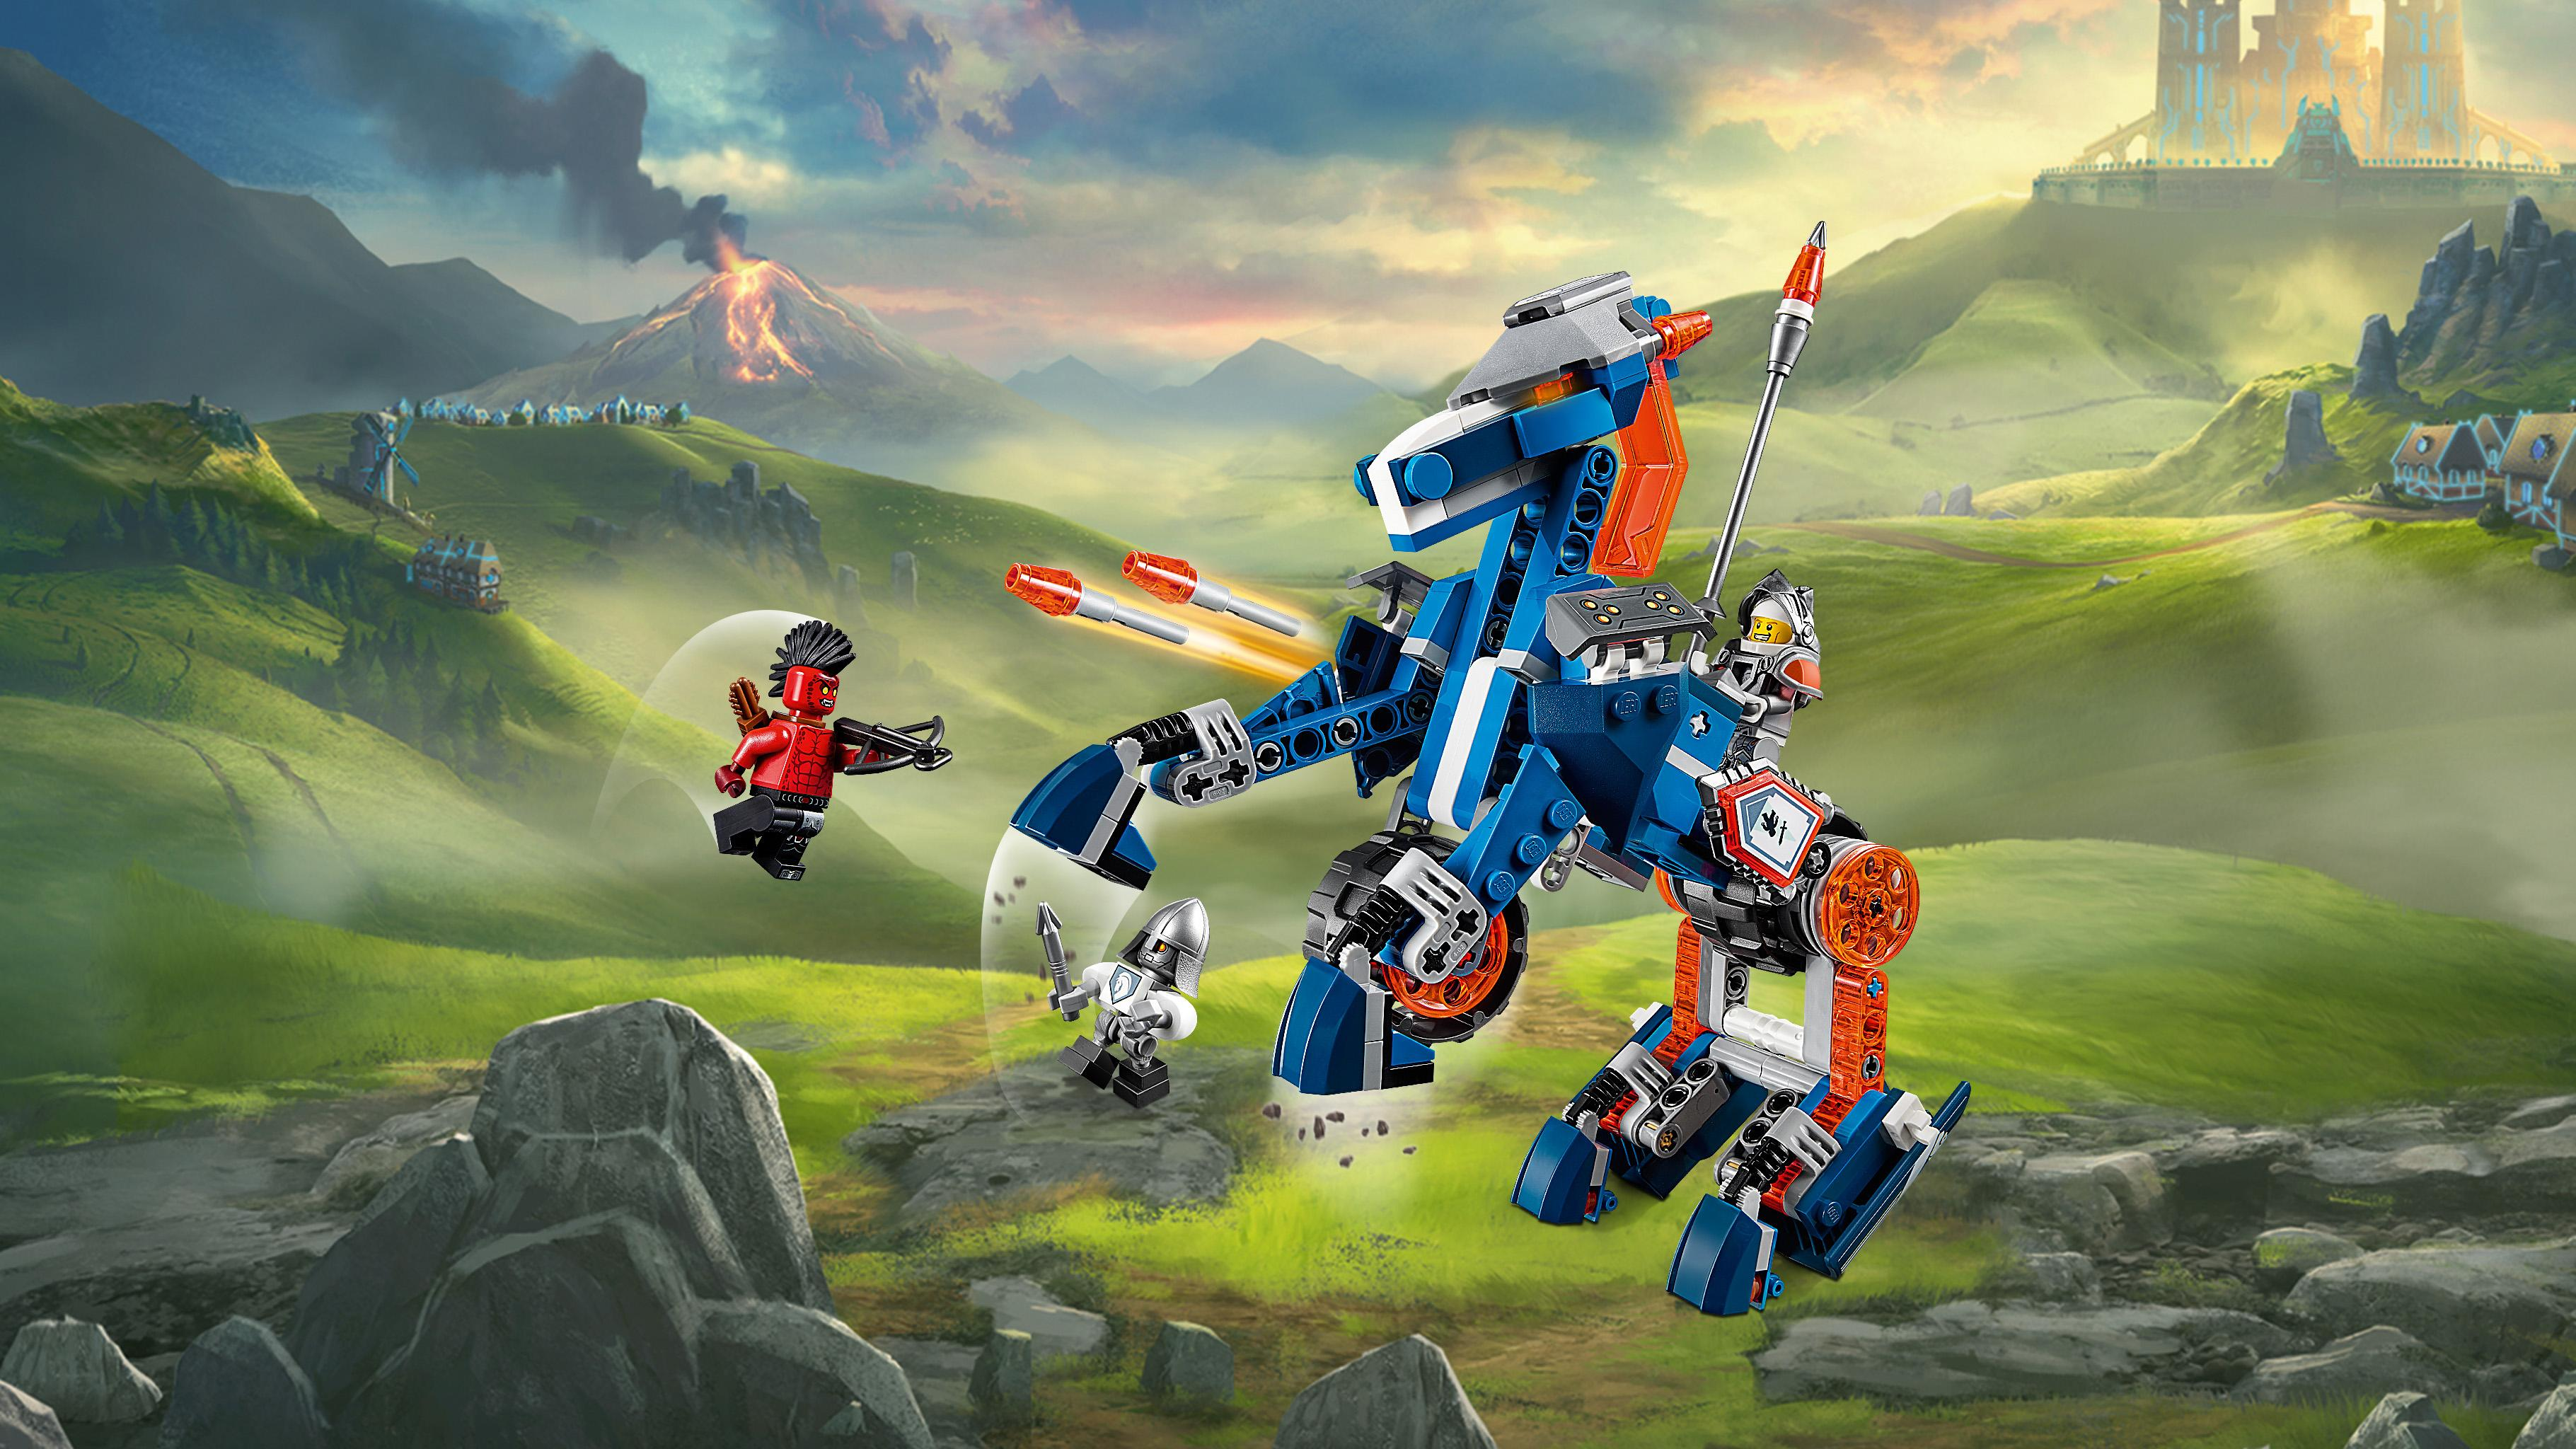 Amazon.com: LEGO NexoKnights Lance's Mecha Horse 70312: Toys & Games